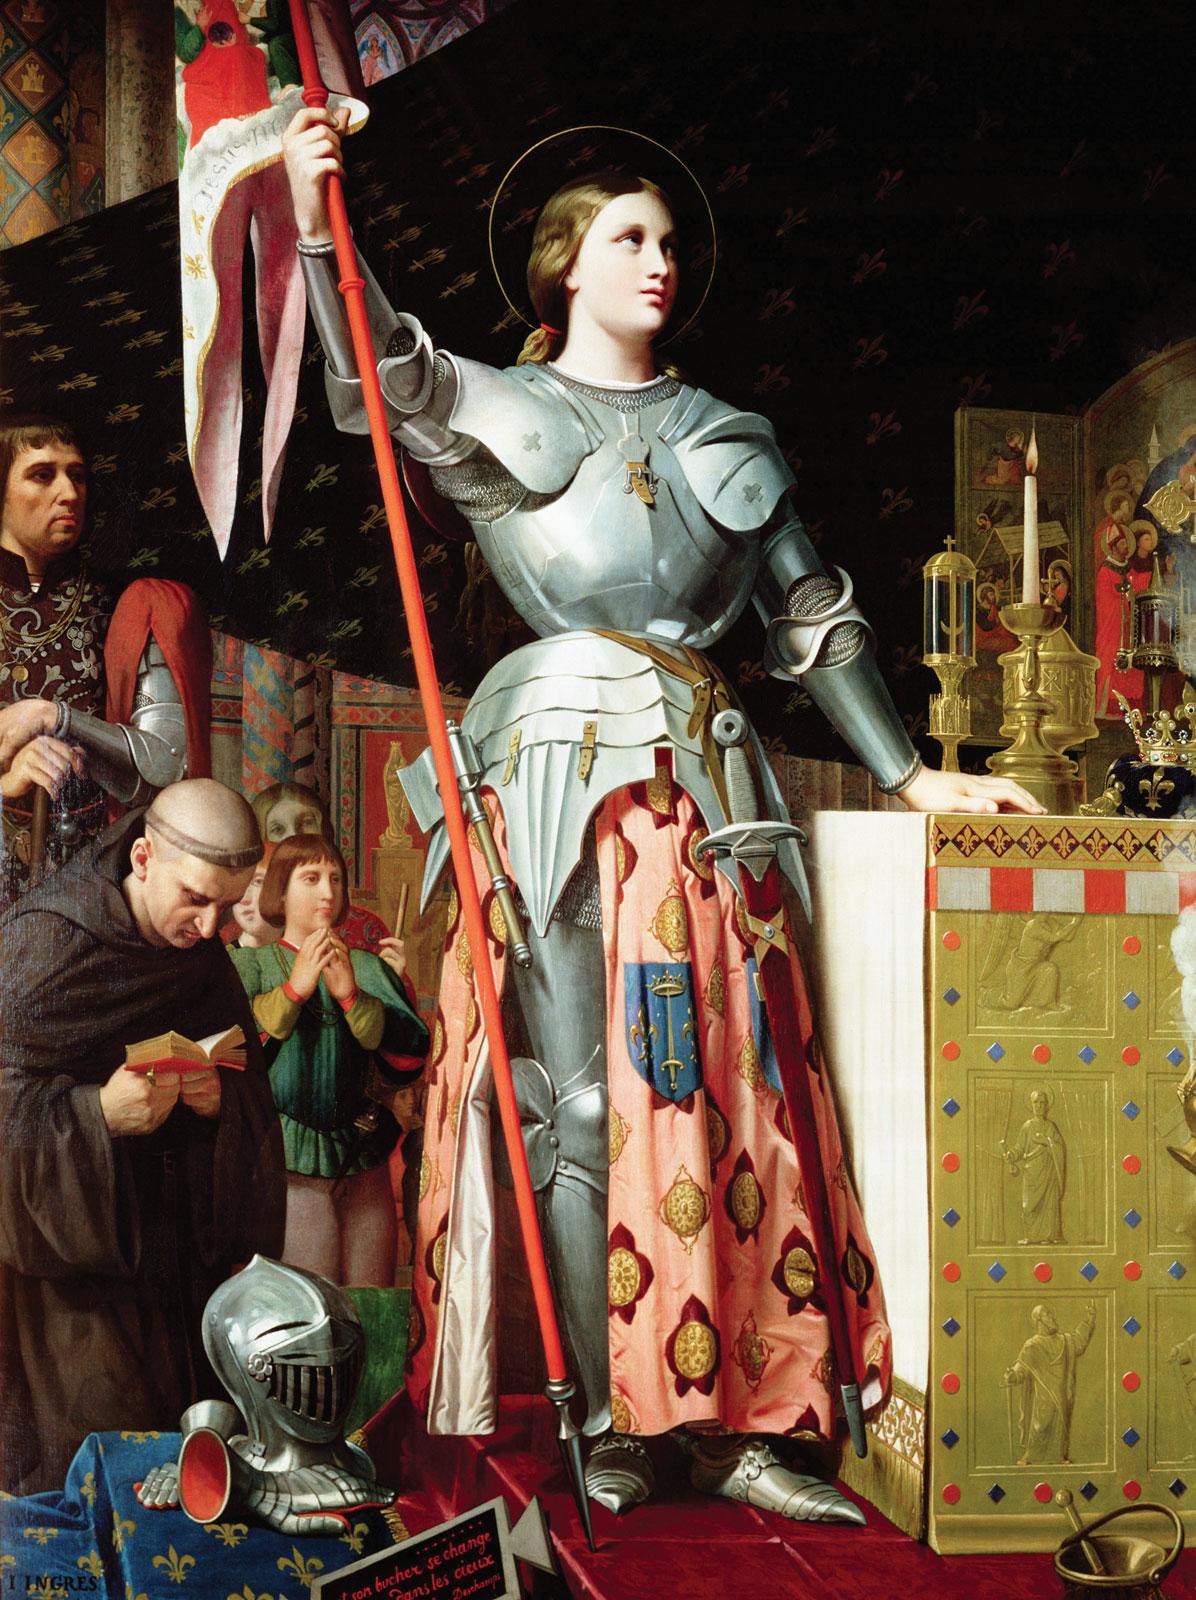 Joana d'Arc n Coroação de Carlos VII, de Jean Auguste Dominique Ingres, 1854. Foto cartelfr.louvre.fr | Wikimedia Commons